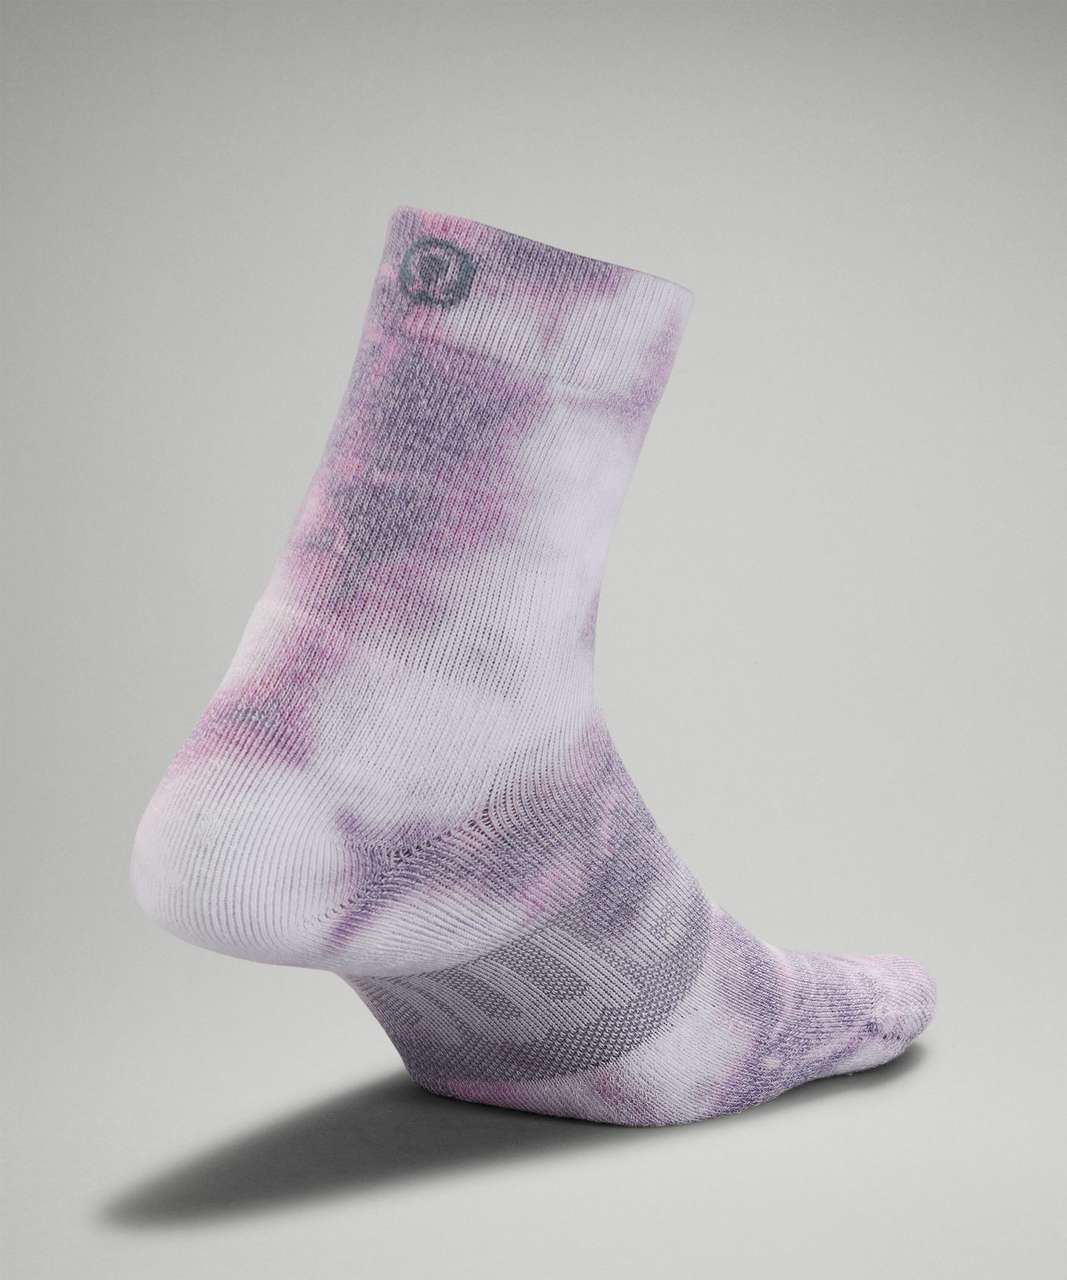 Lululemon Daily Stride Mid-Crew Tie Dye Sock - Dusky Lavender